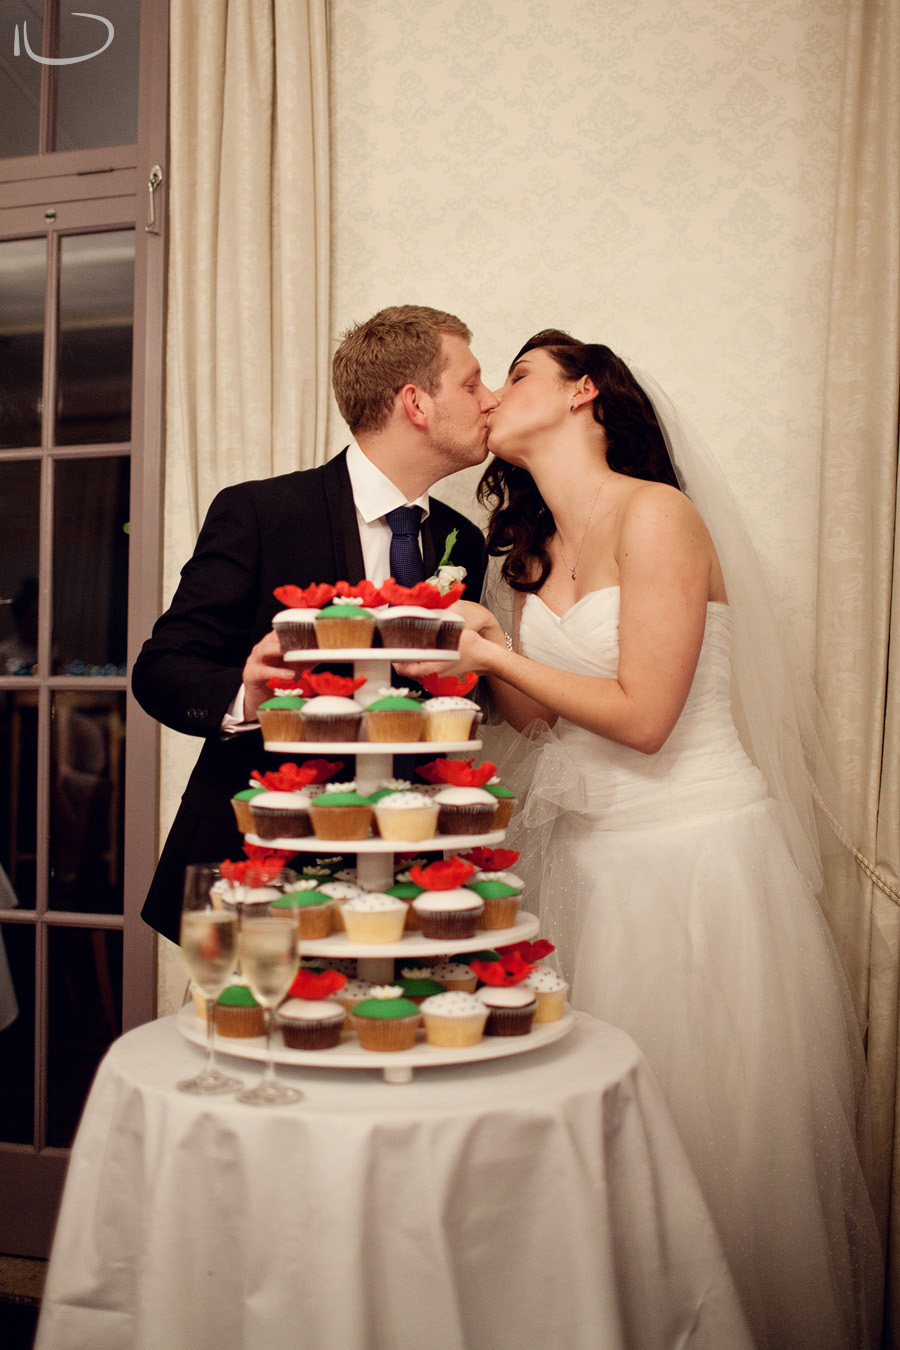 Gunners Barracks Wedding Photographer: Bride & groom kiss after cake cutting